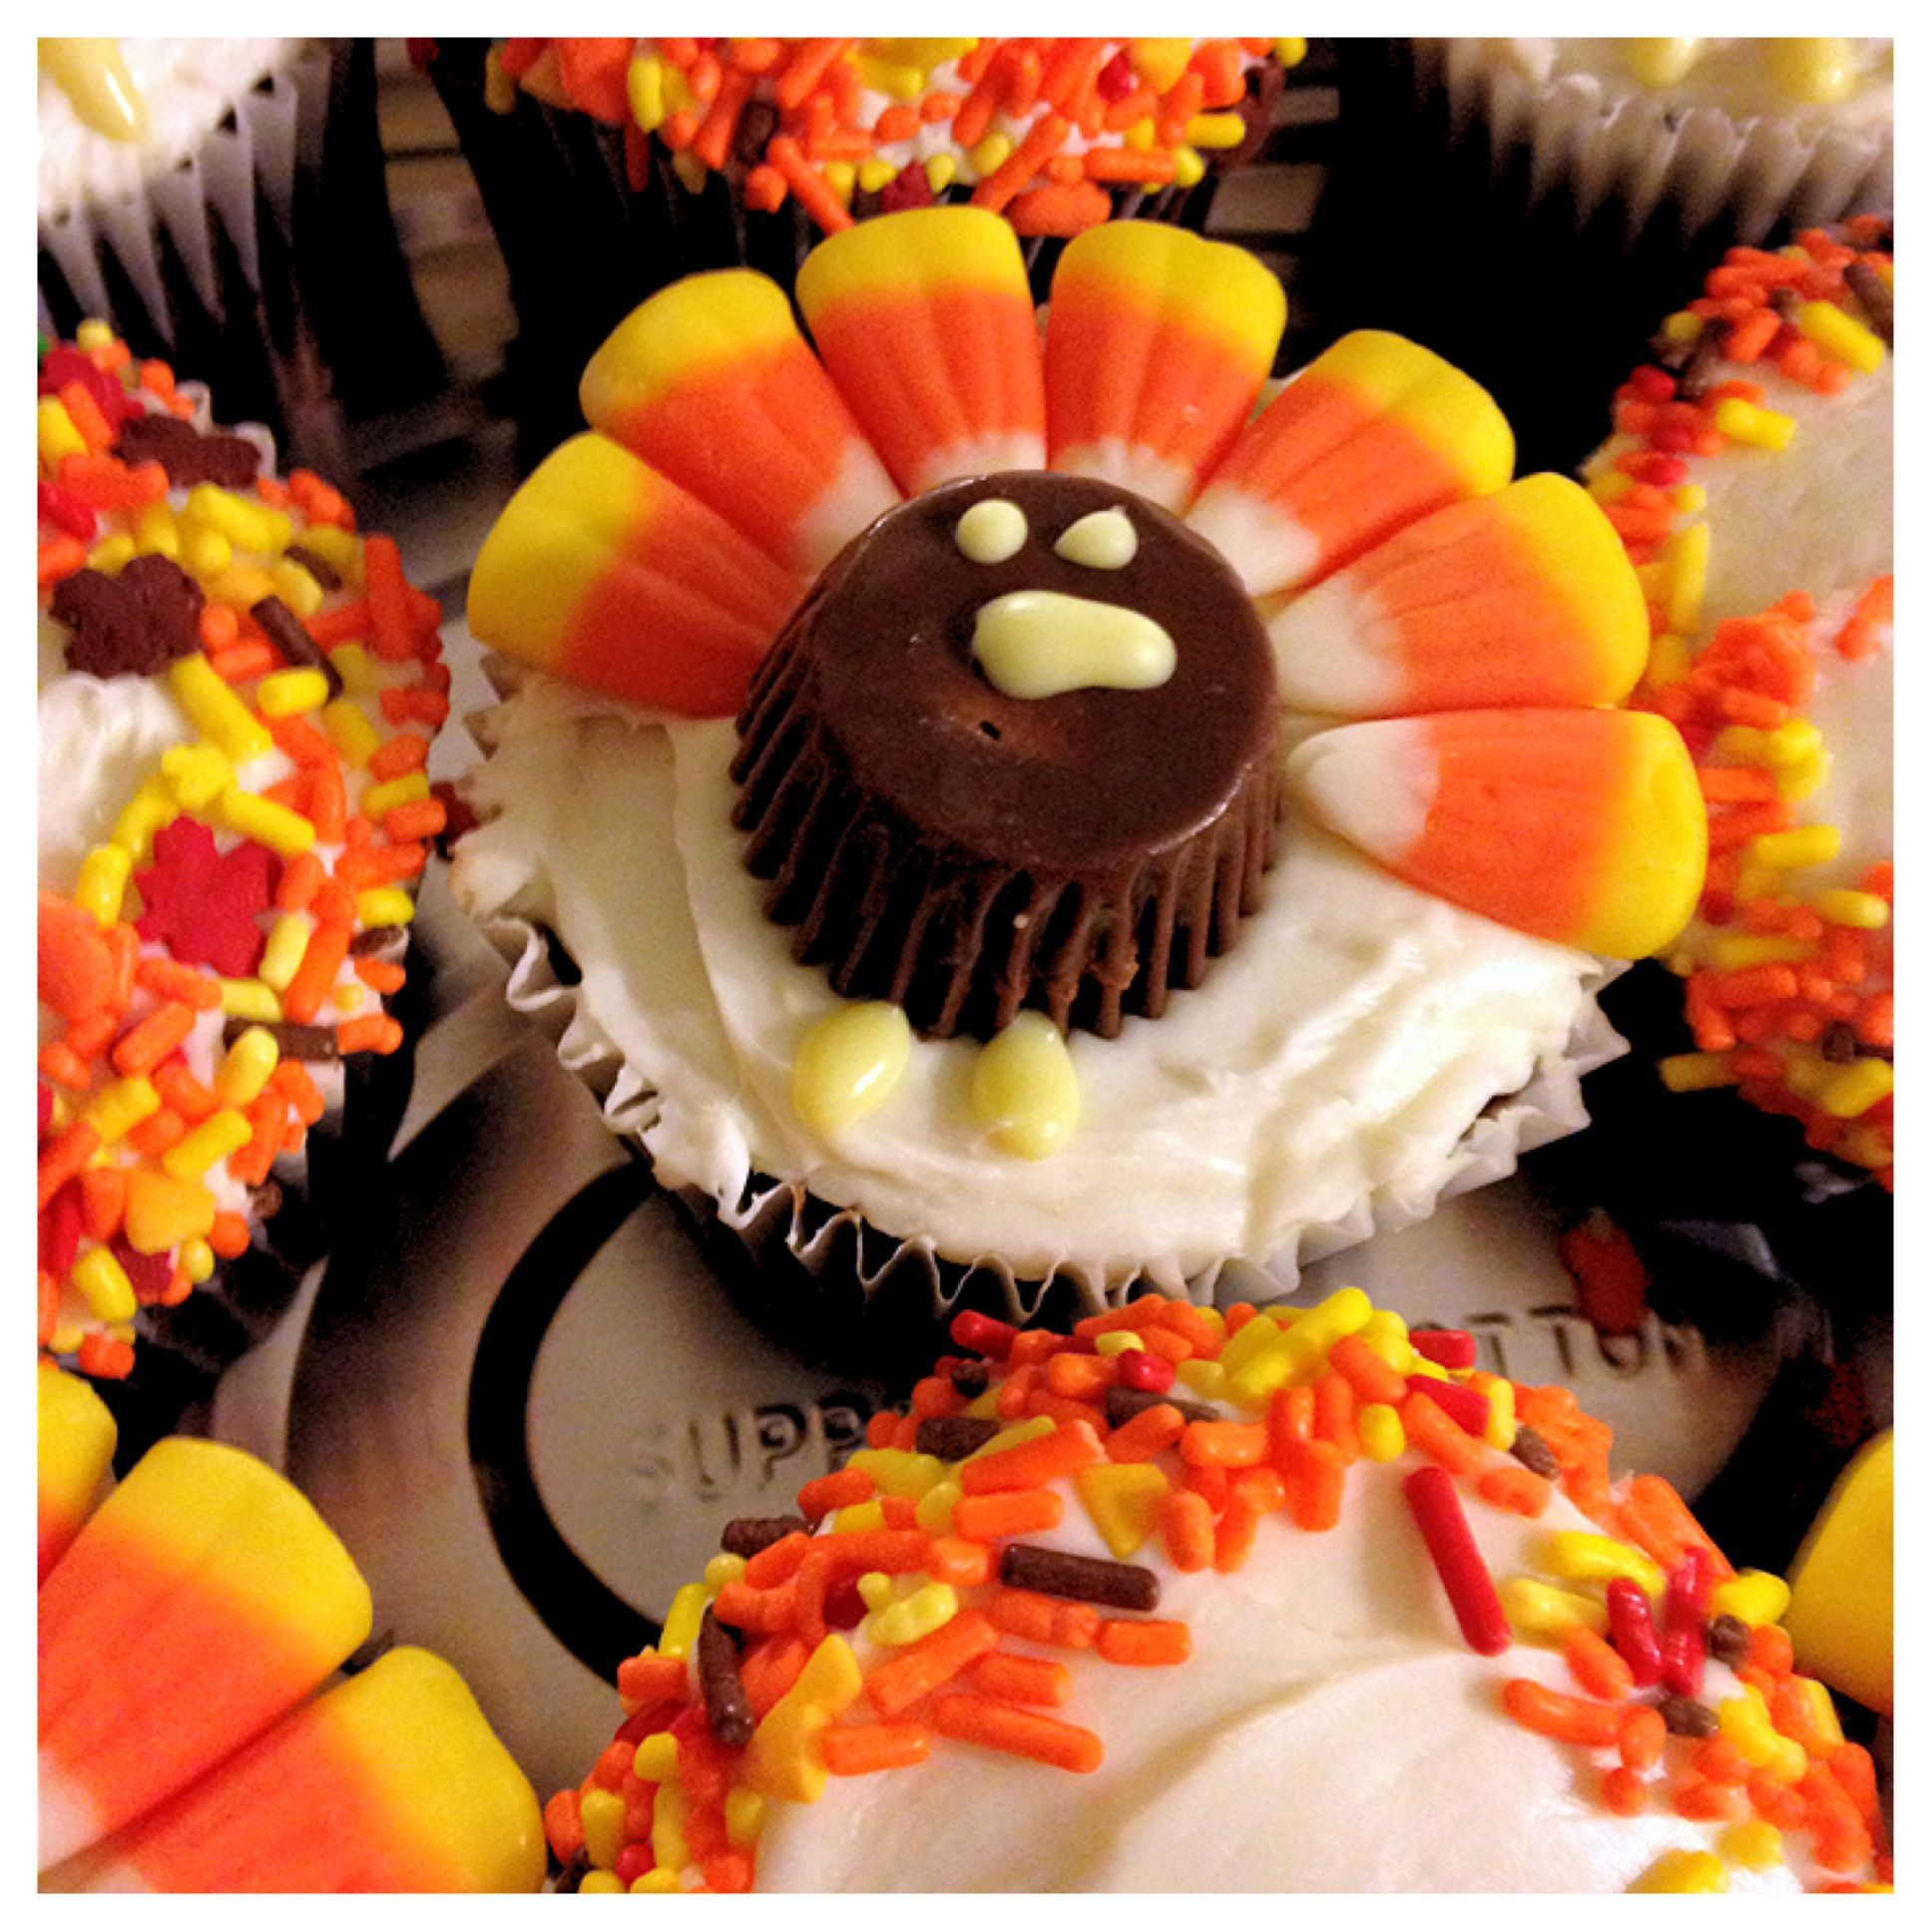 Thanksgiving turkey cupcakes fun to make with kids for Decorations for thanksgiving cupcakes